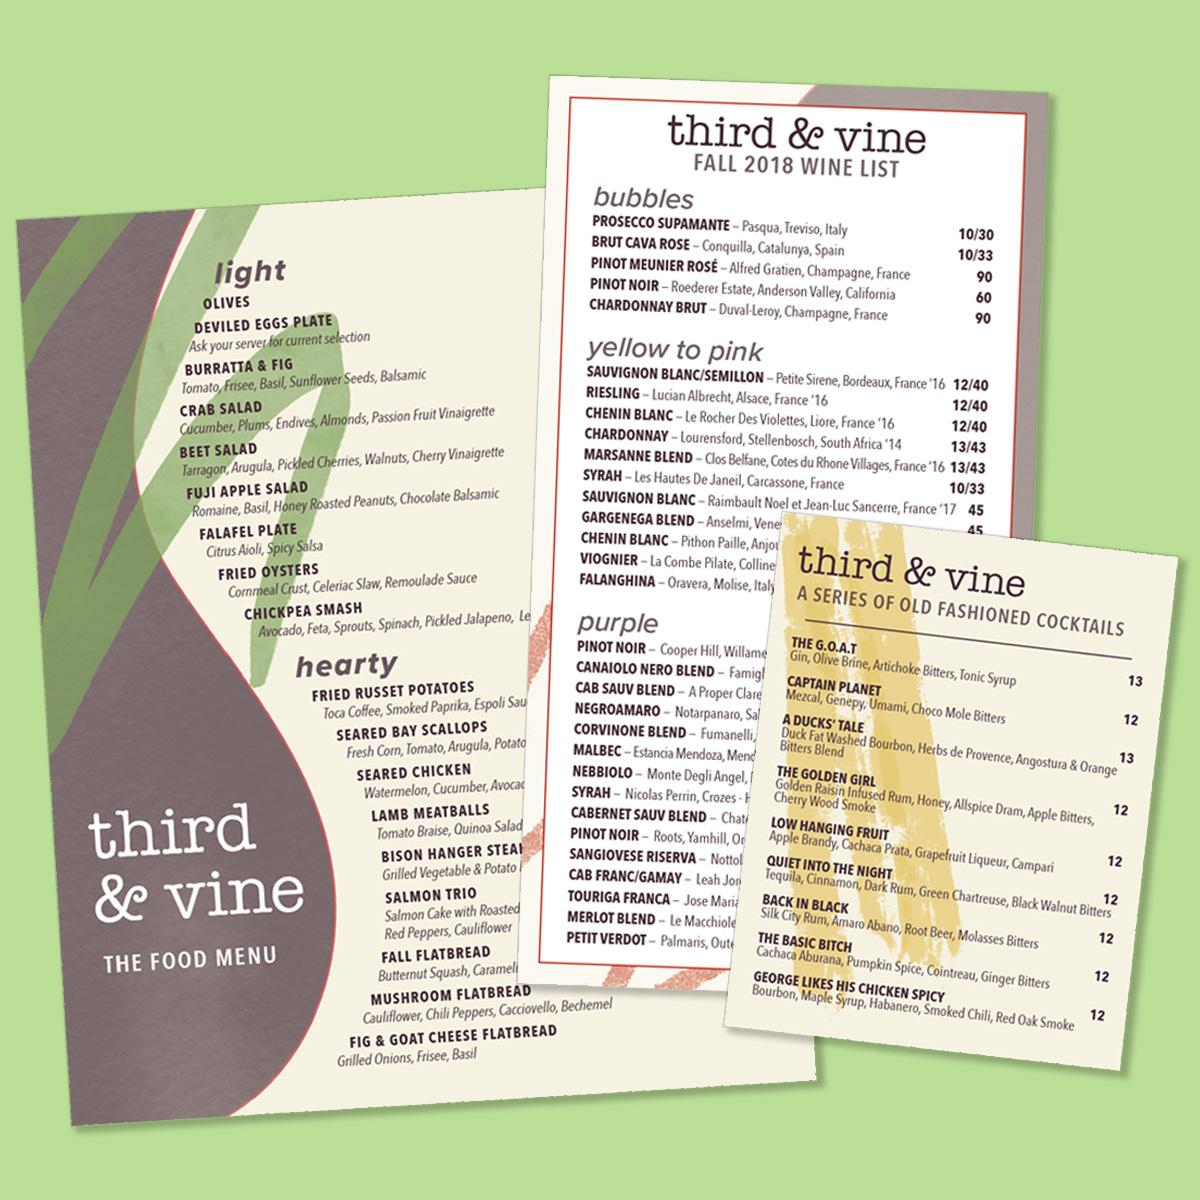 PRINT / Food, Drink, and Specials Menus